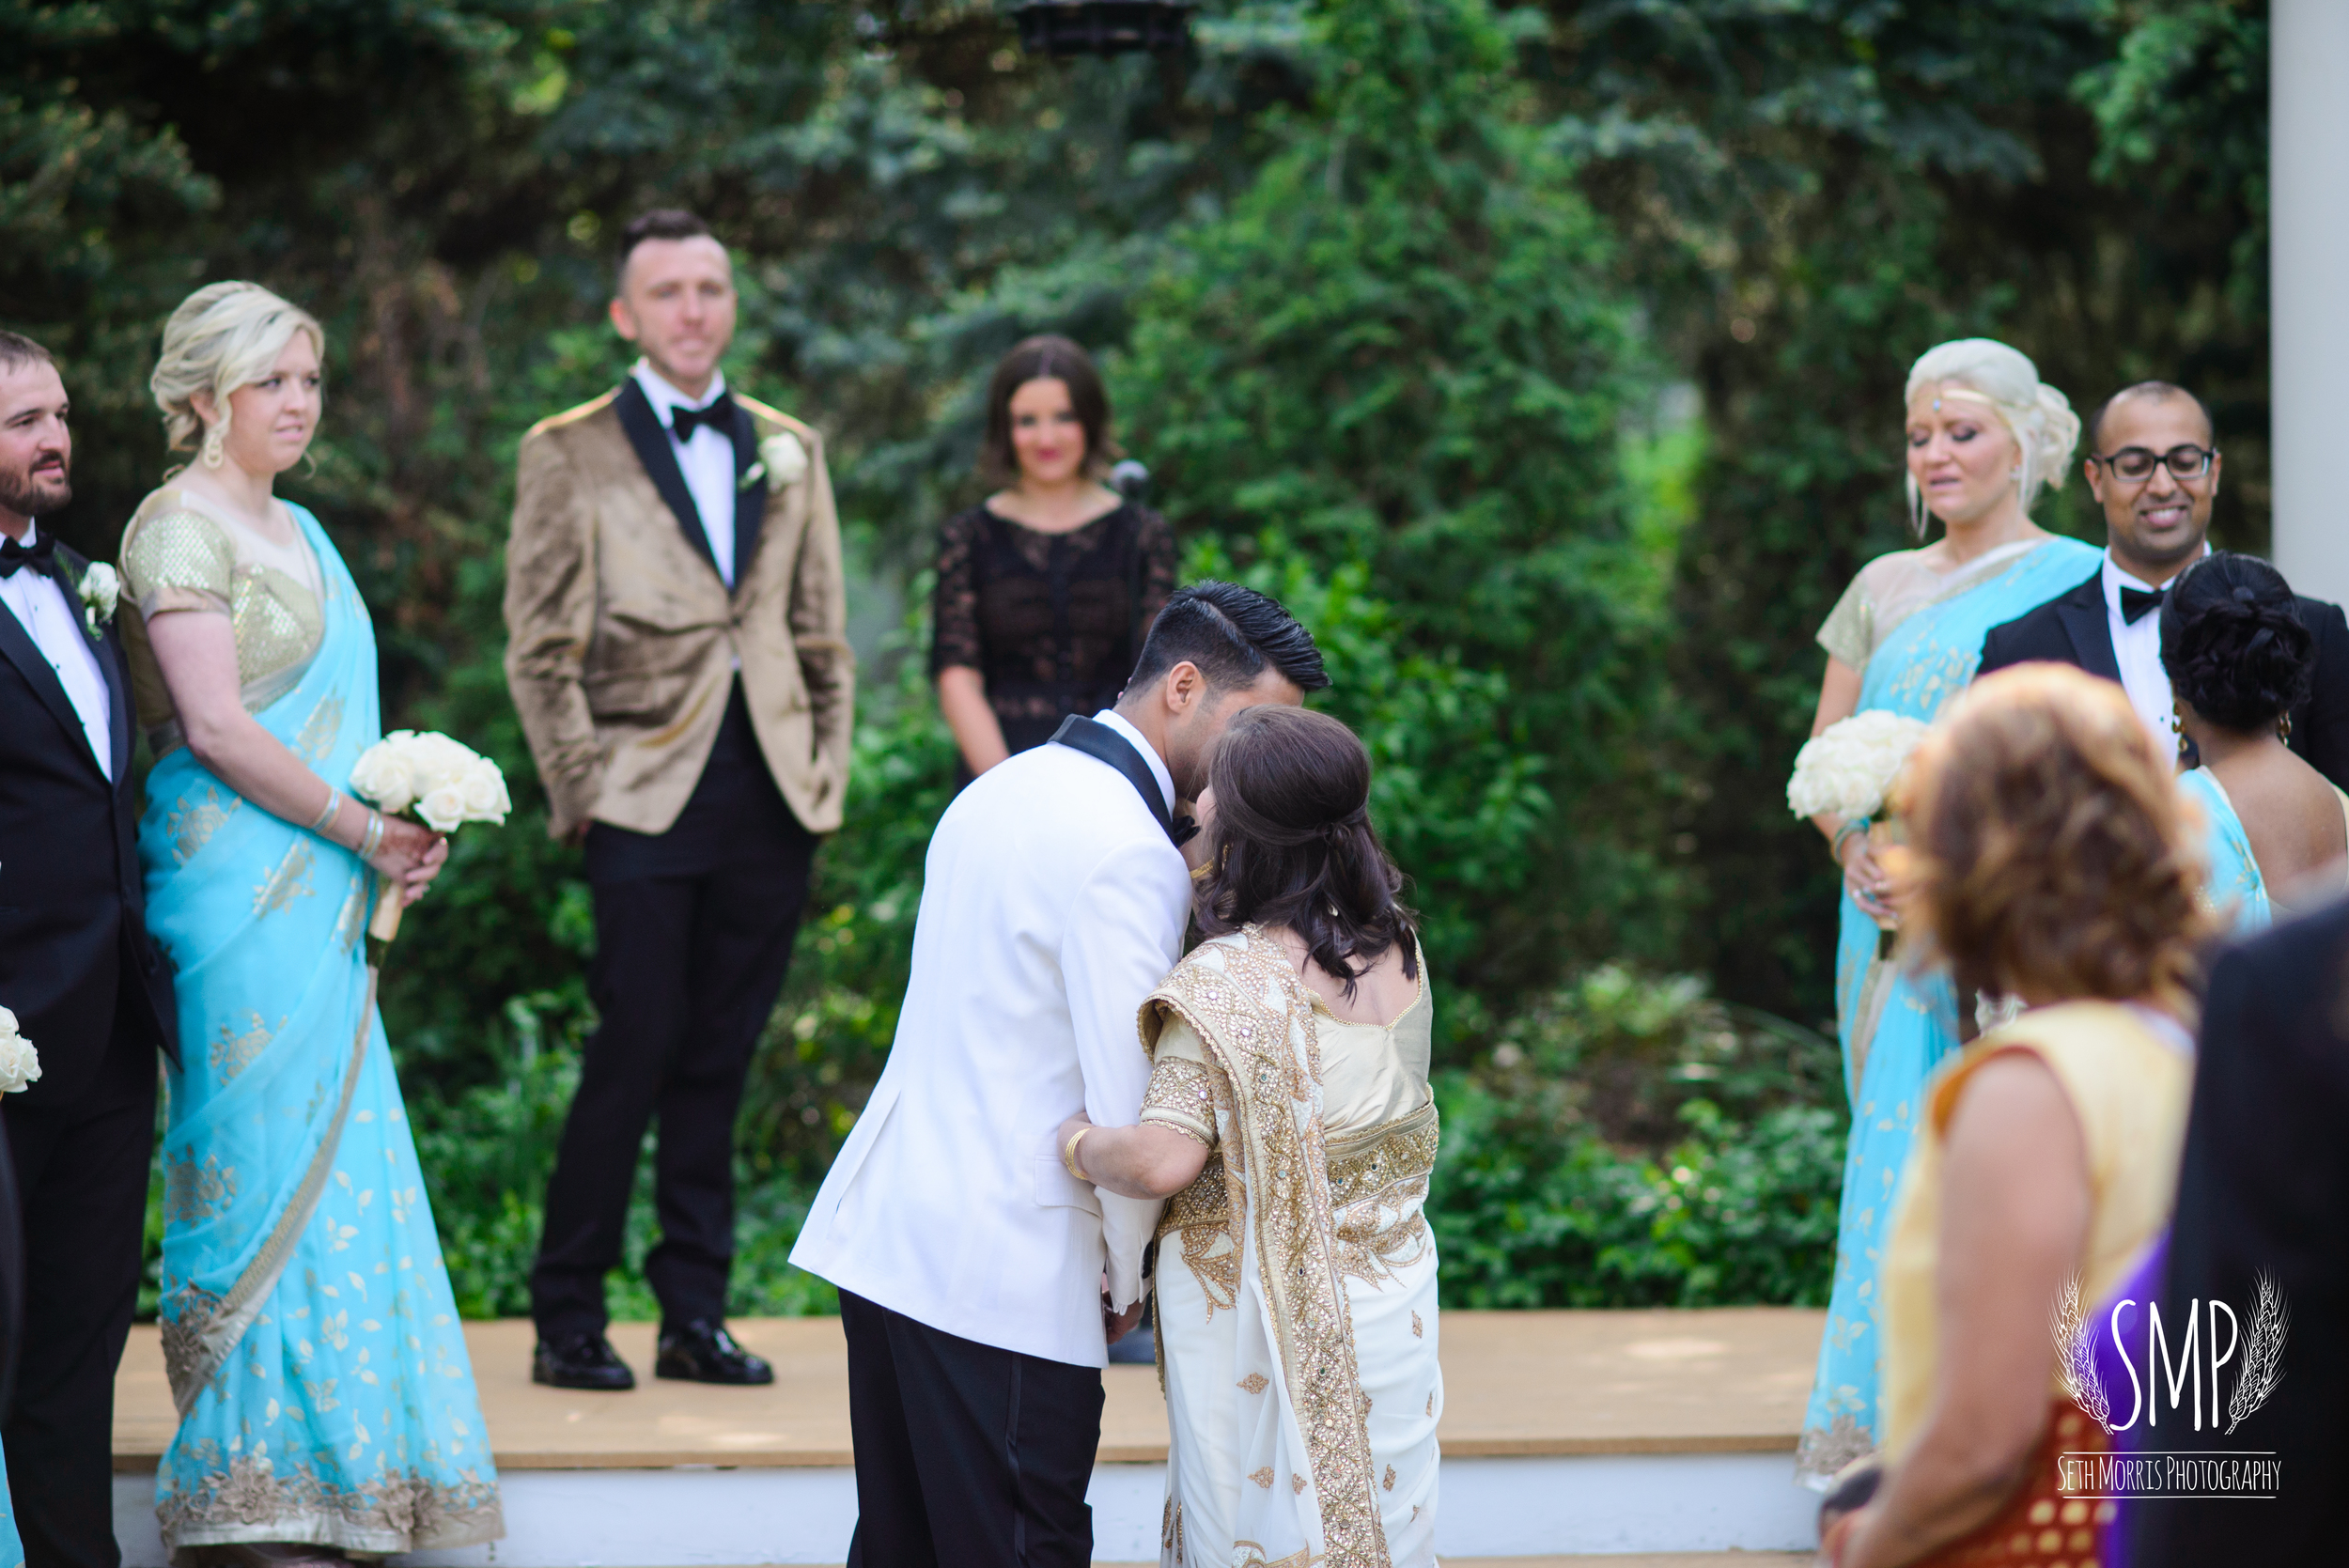 same-sex-wedding-photographer-chicago-illinois-65.jpg